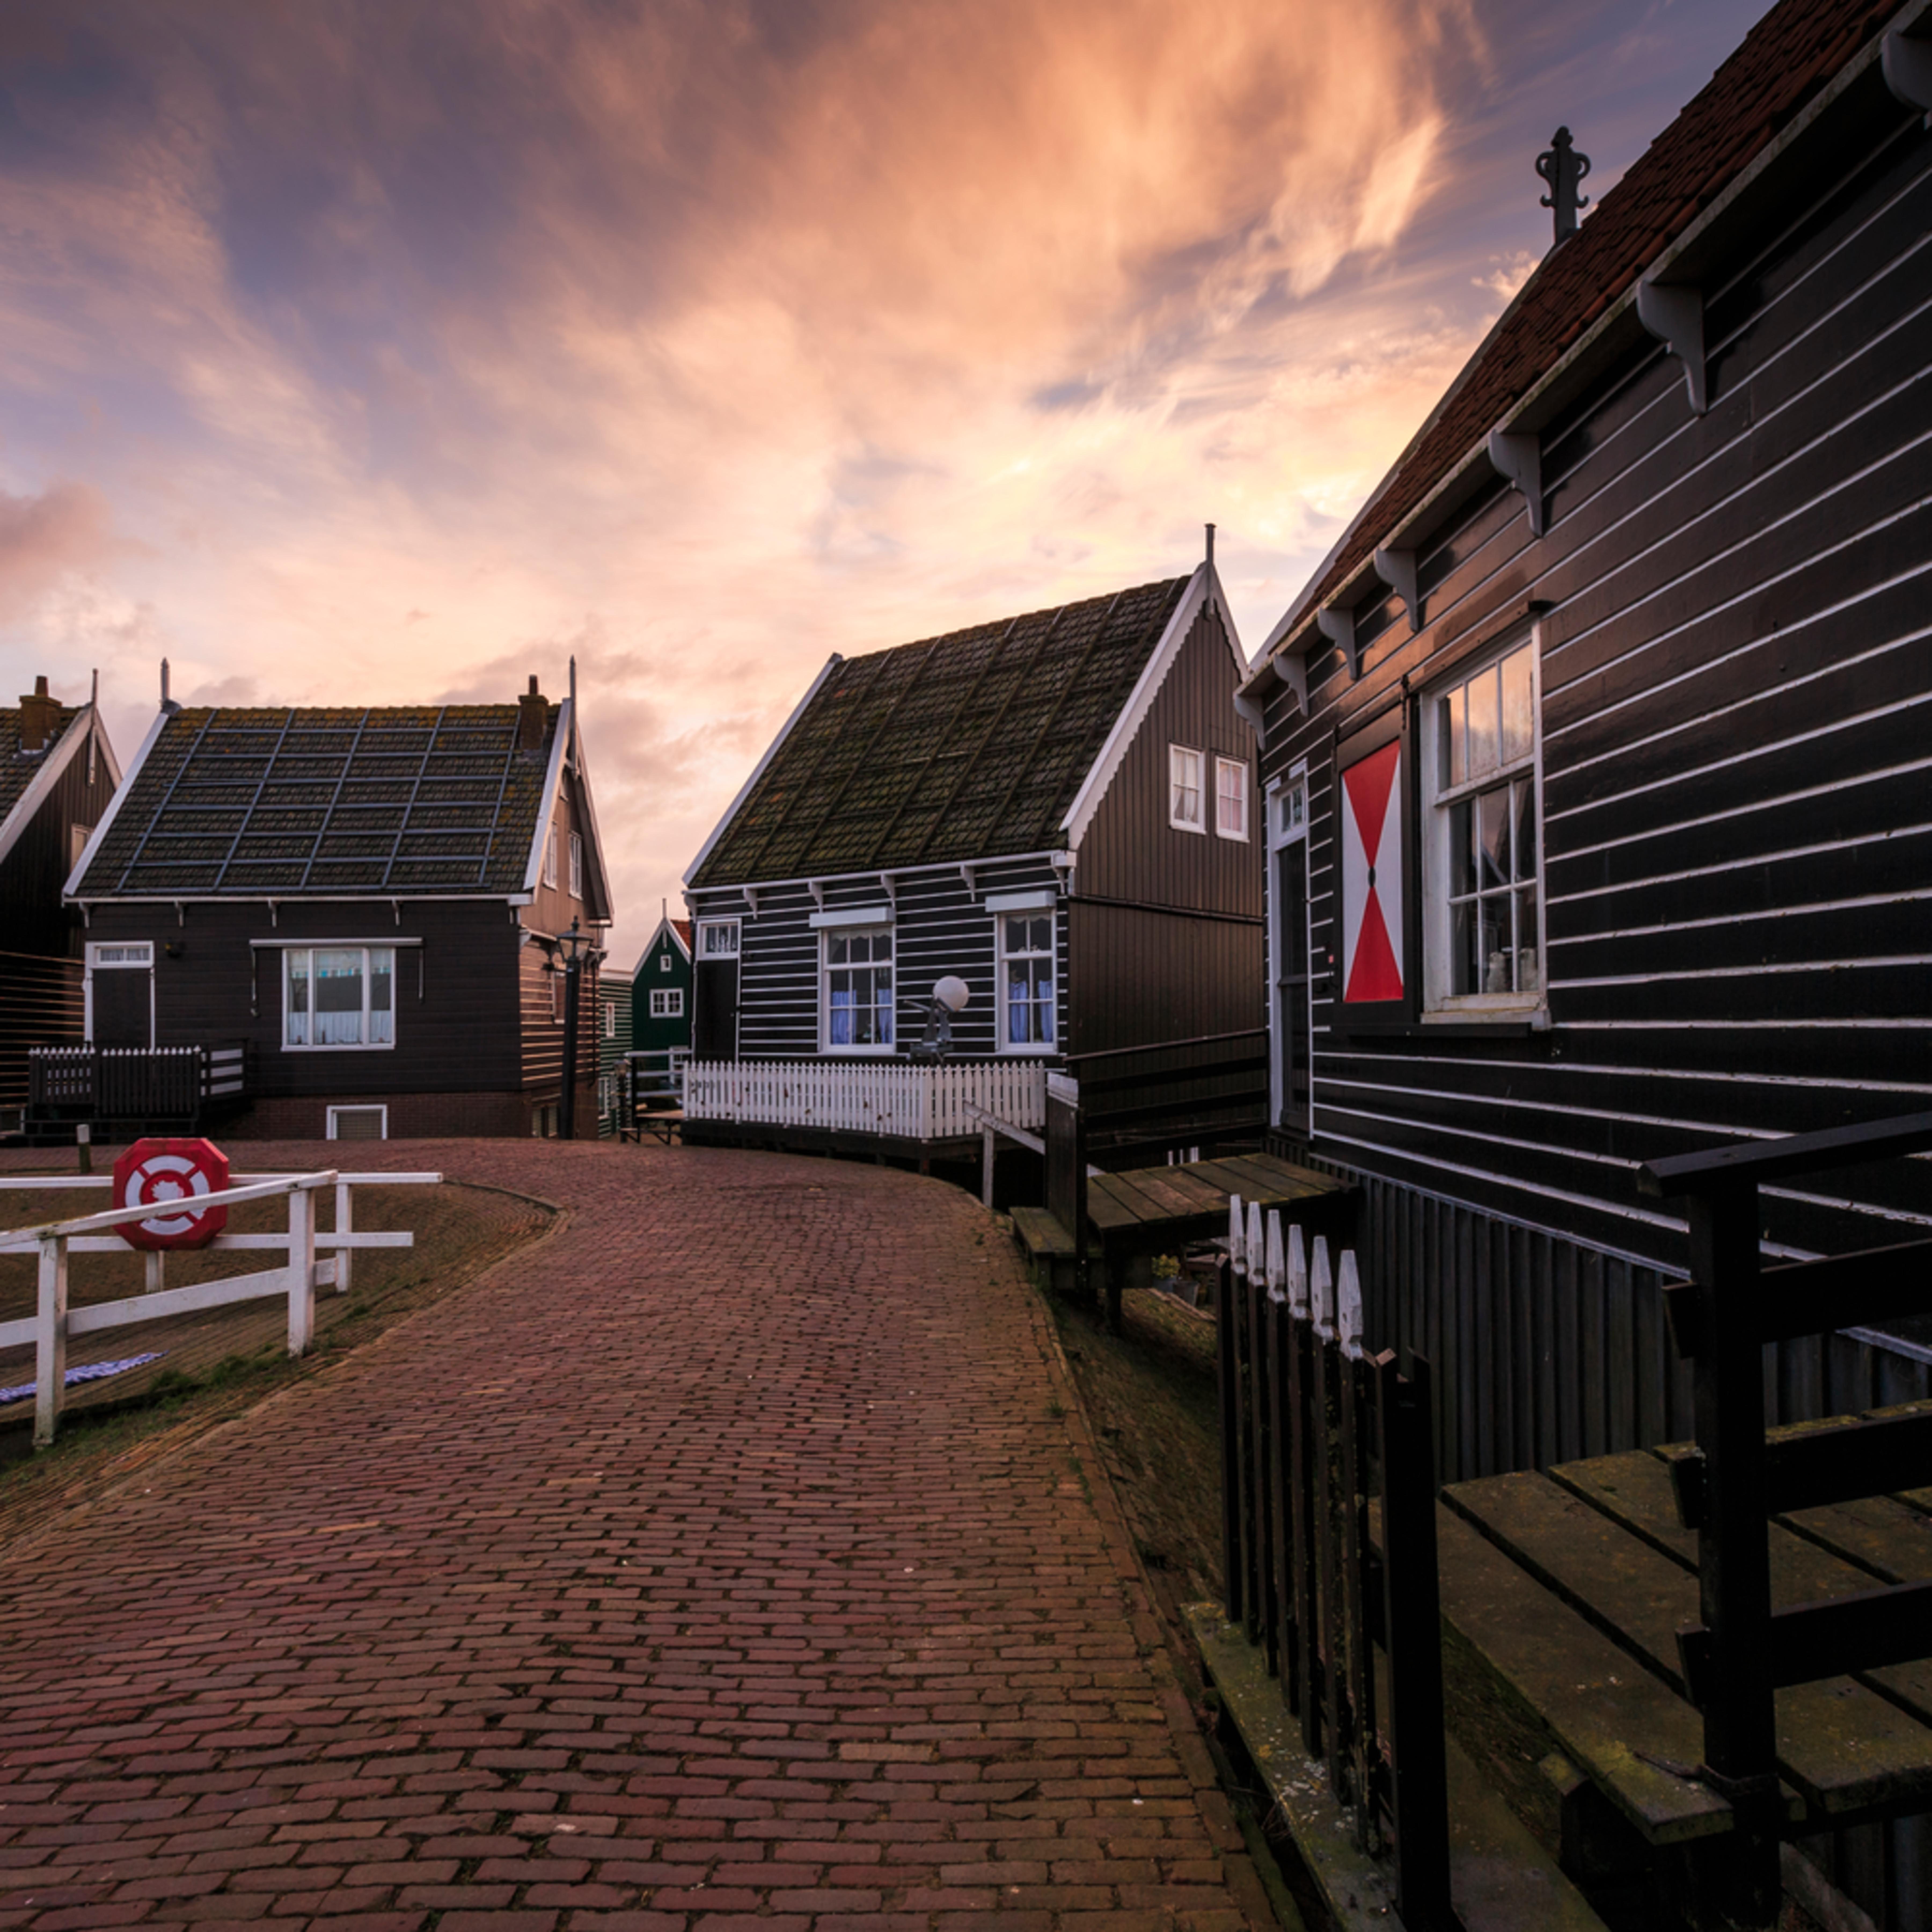 20170112 travel netherlands rural 0064 edit gtkshj